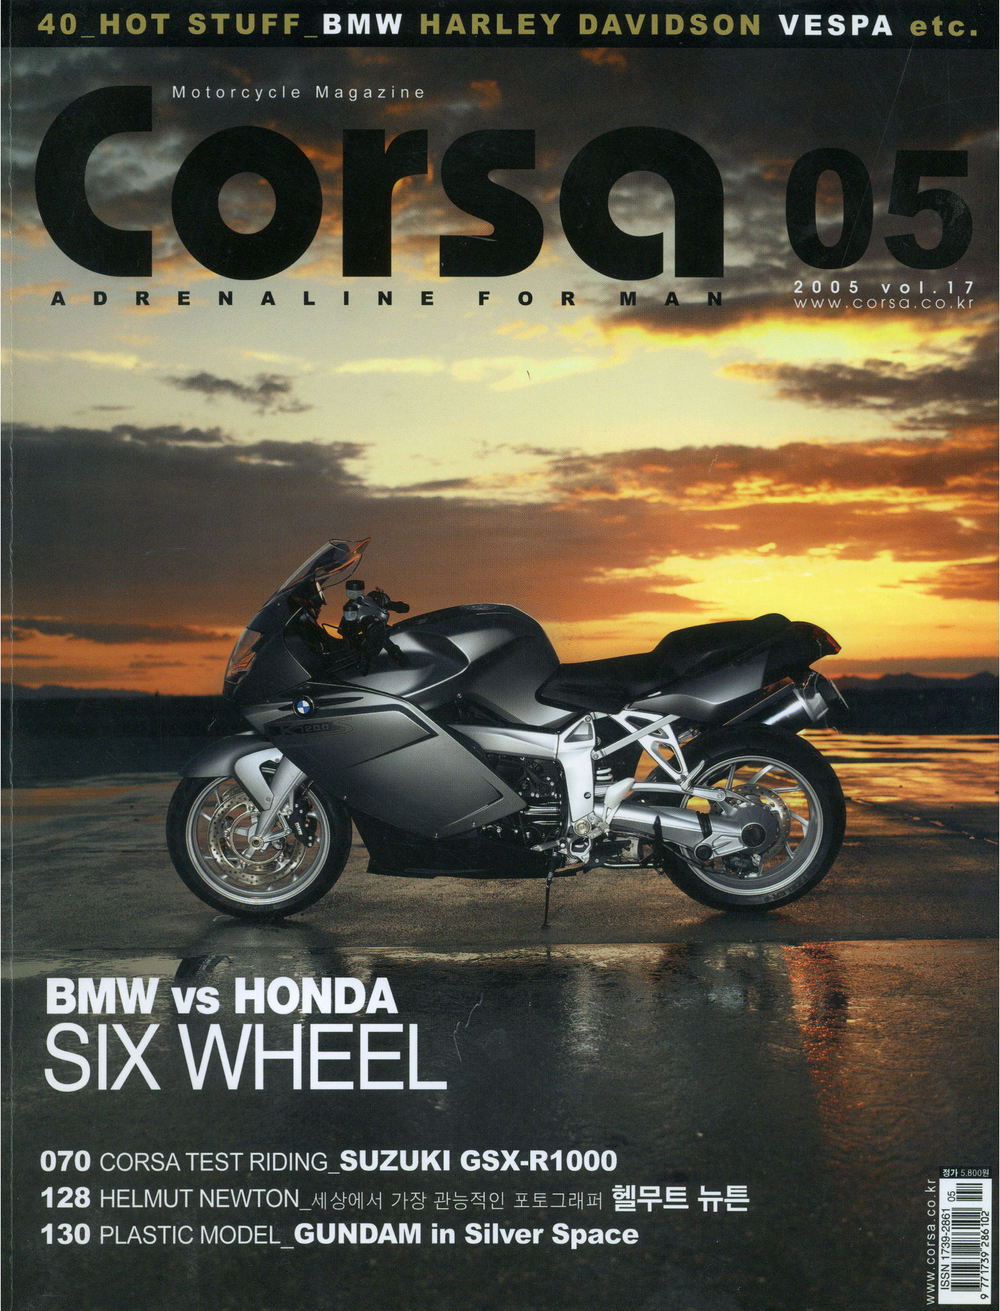 2005-5 Corsa cover.jpg